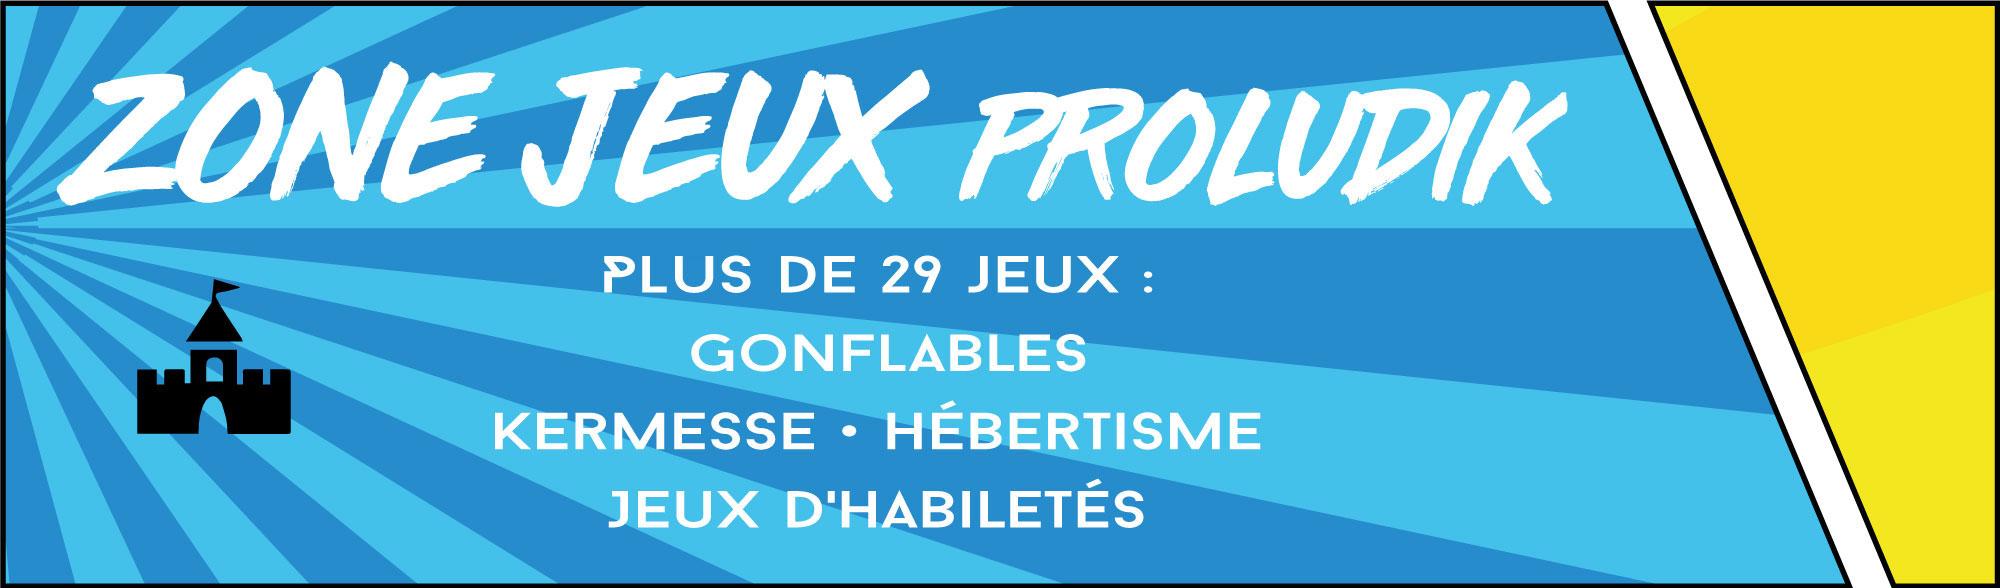 zone jeux Proludik